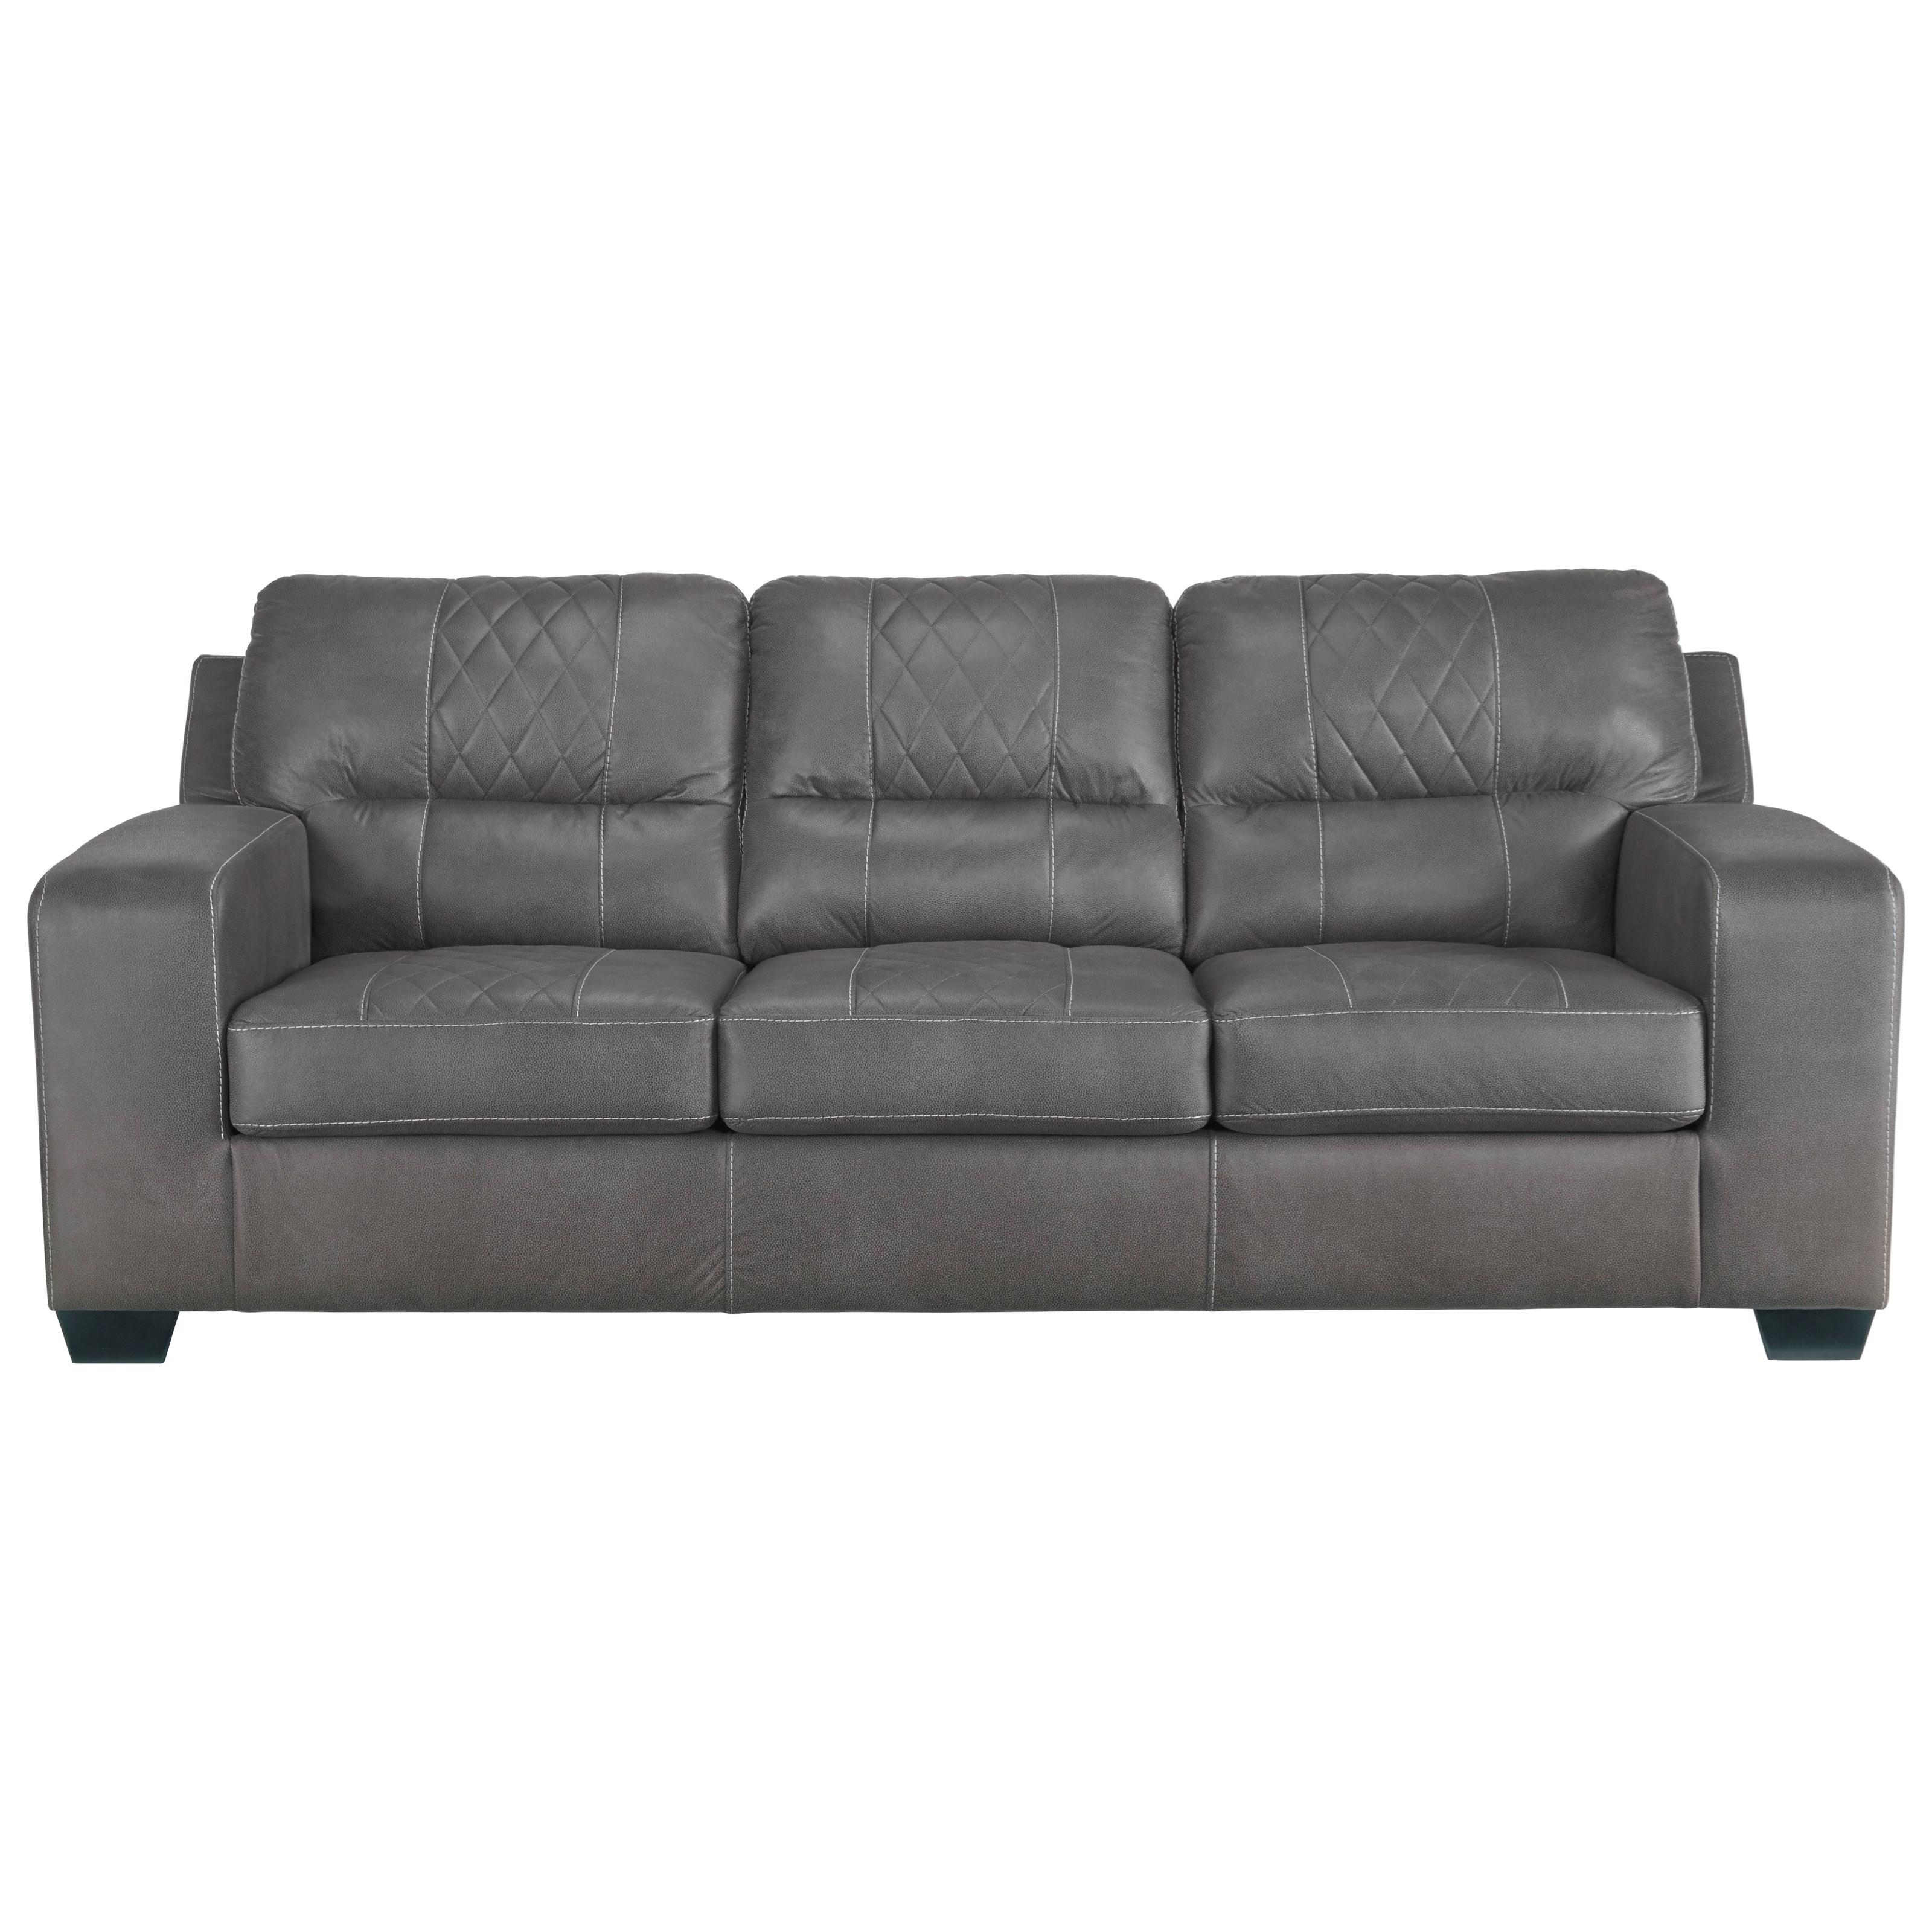 benchcraft narzole contemporary sofa sleeper with bi fold queen memory foam mattress value. Black Bedroom Furniture Sets. Home Design Ideas